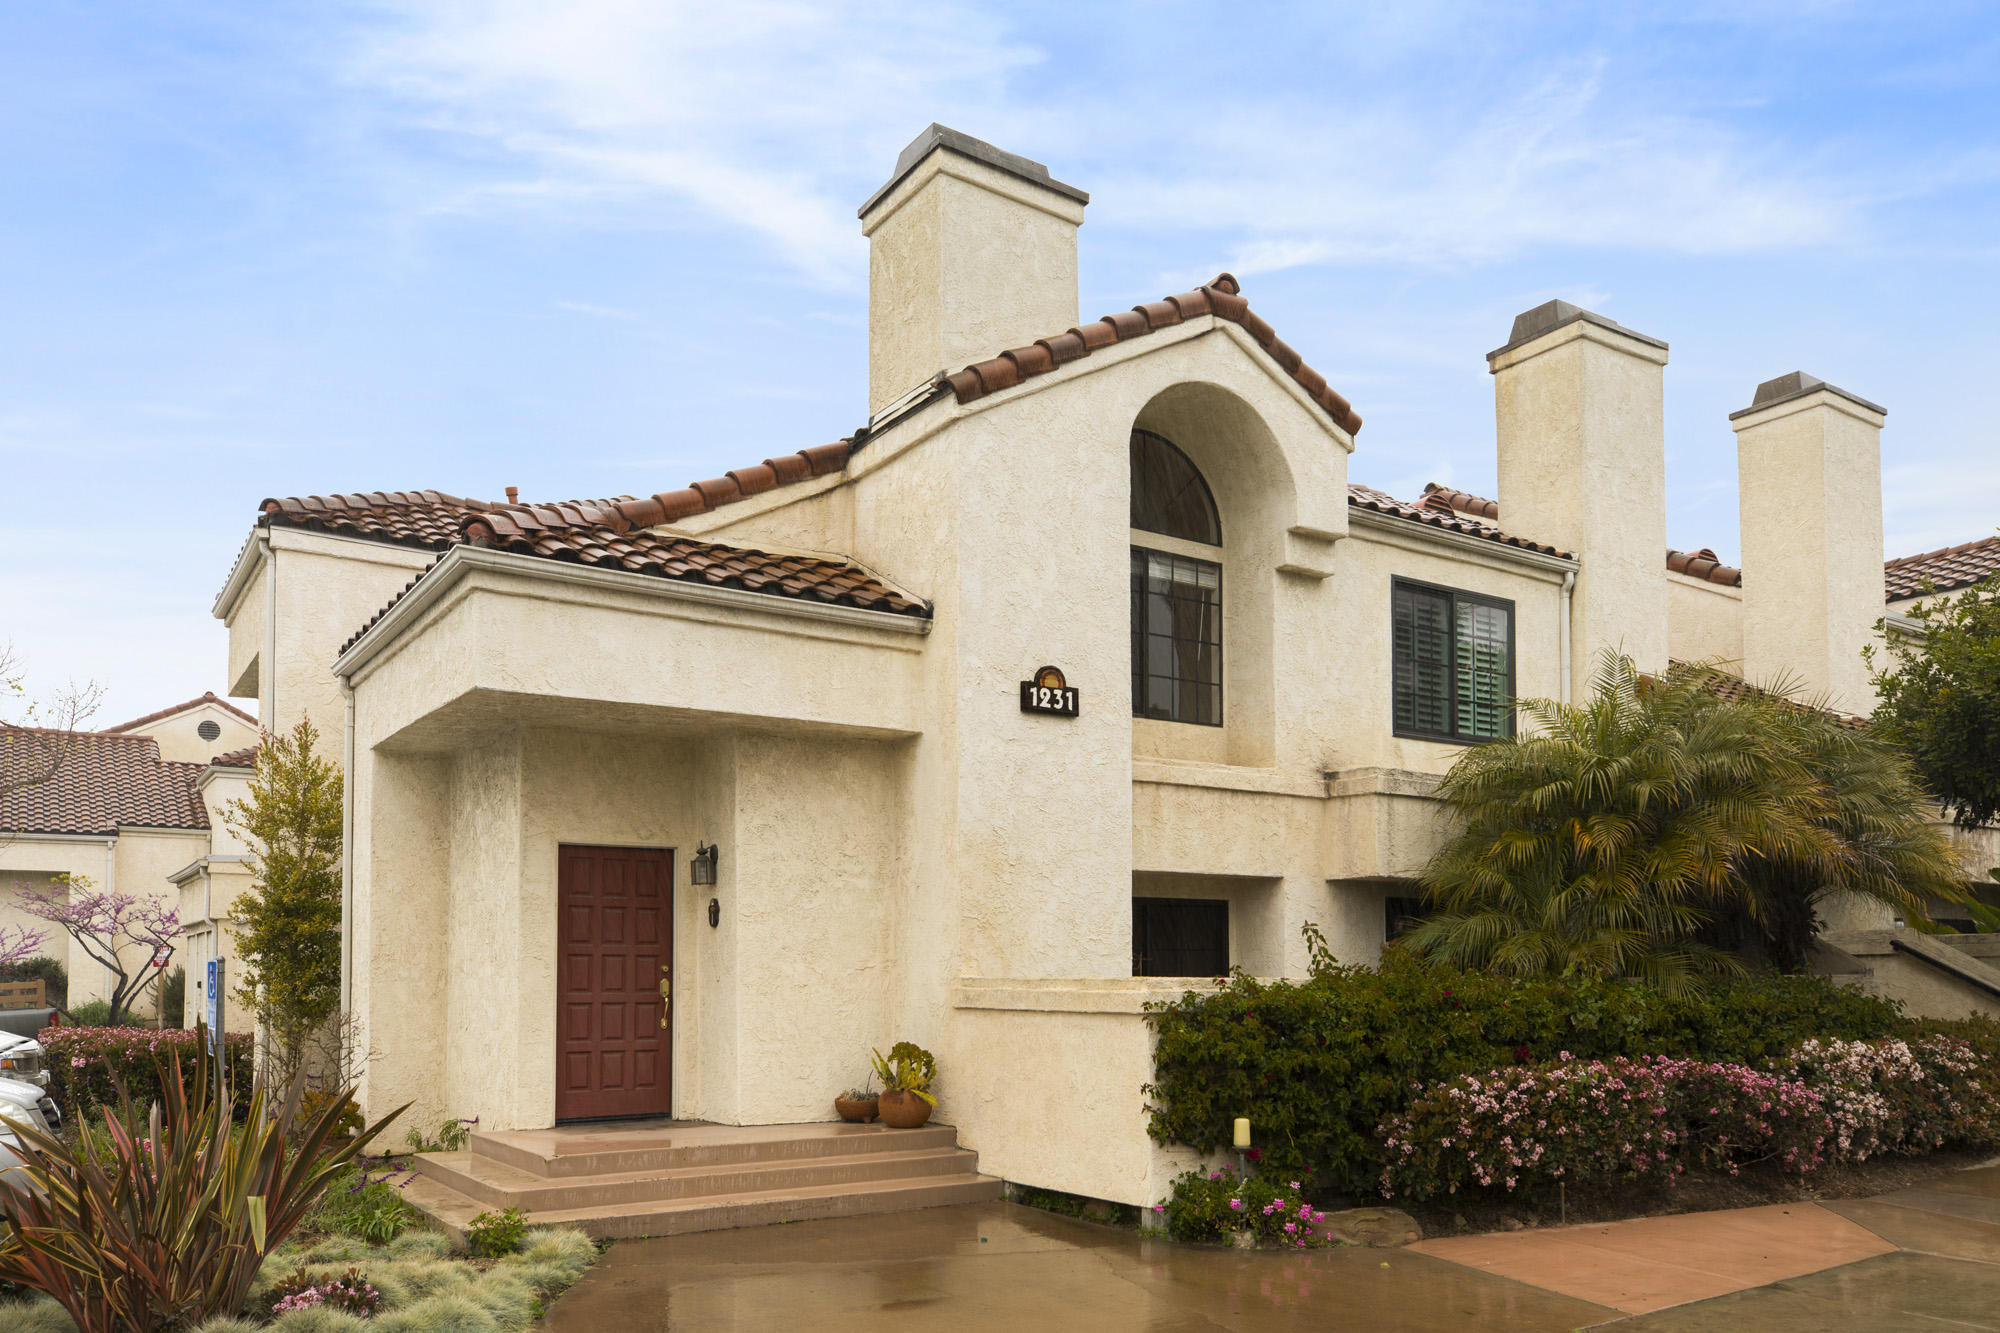 Property photo for 1231 Franciscan Ct #1 Carpinteria, California 93013 - 19-1035